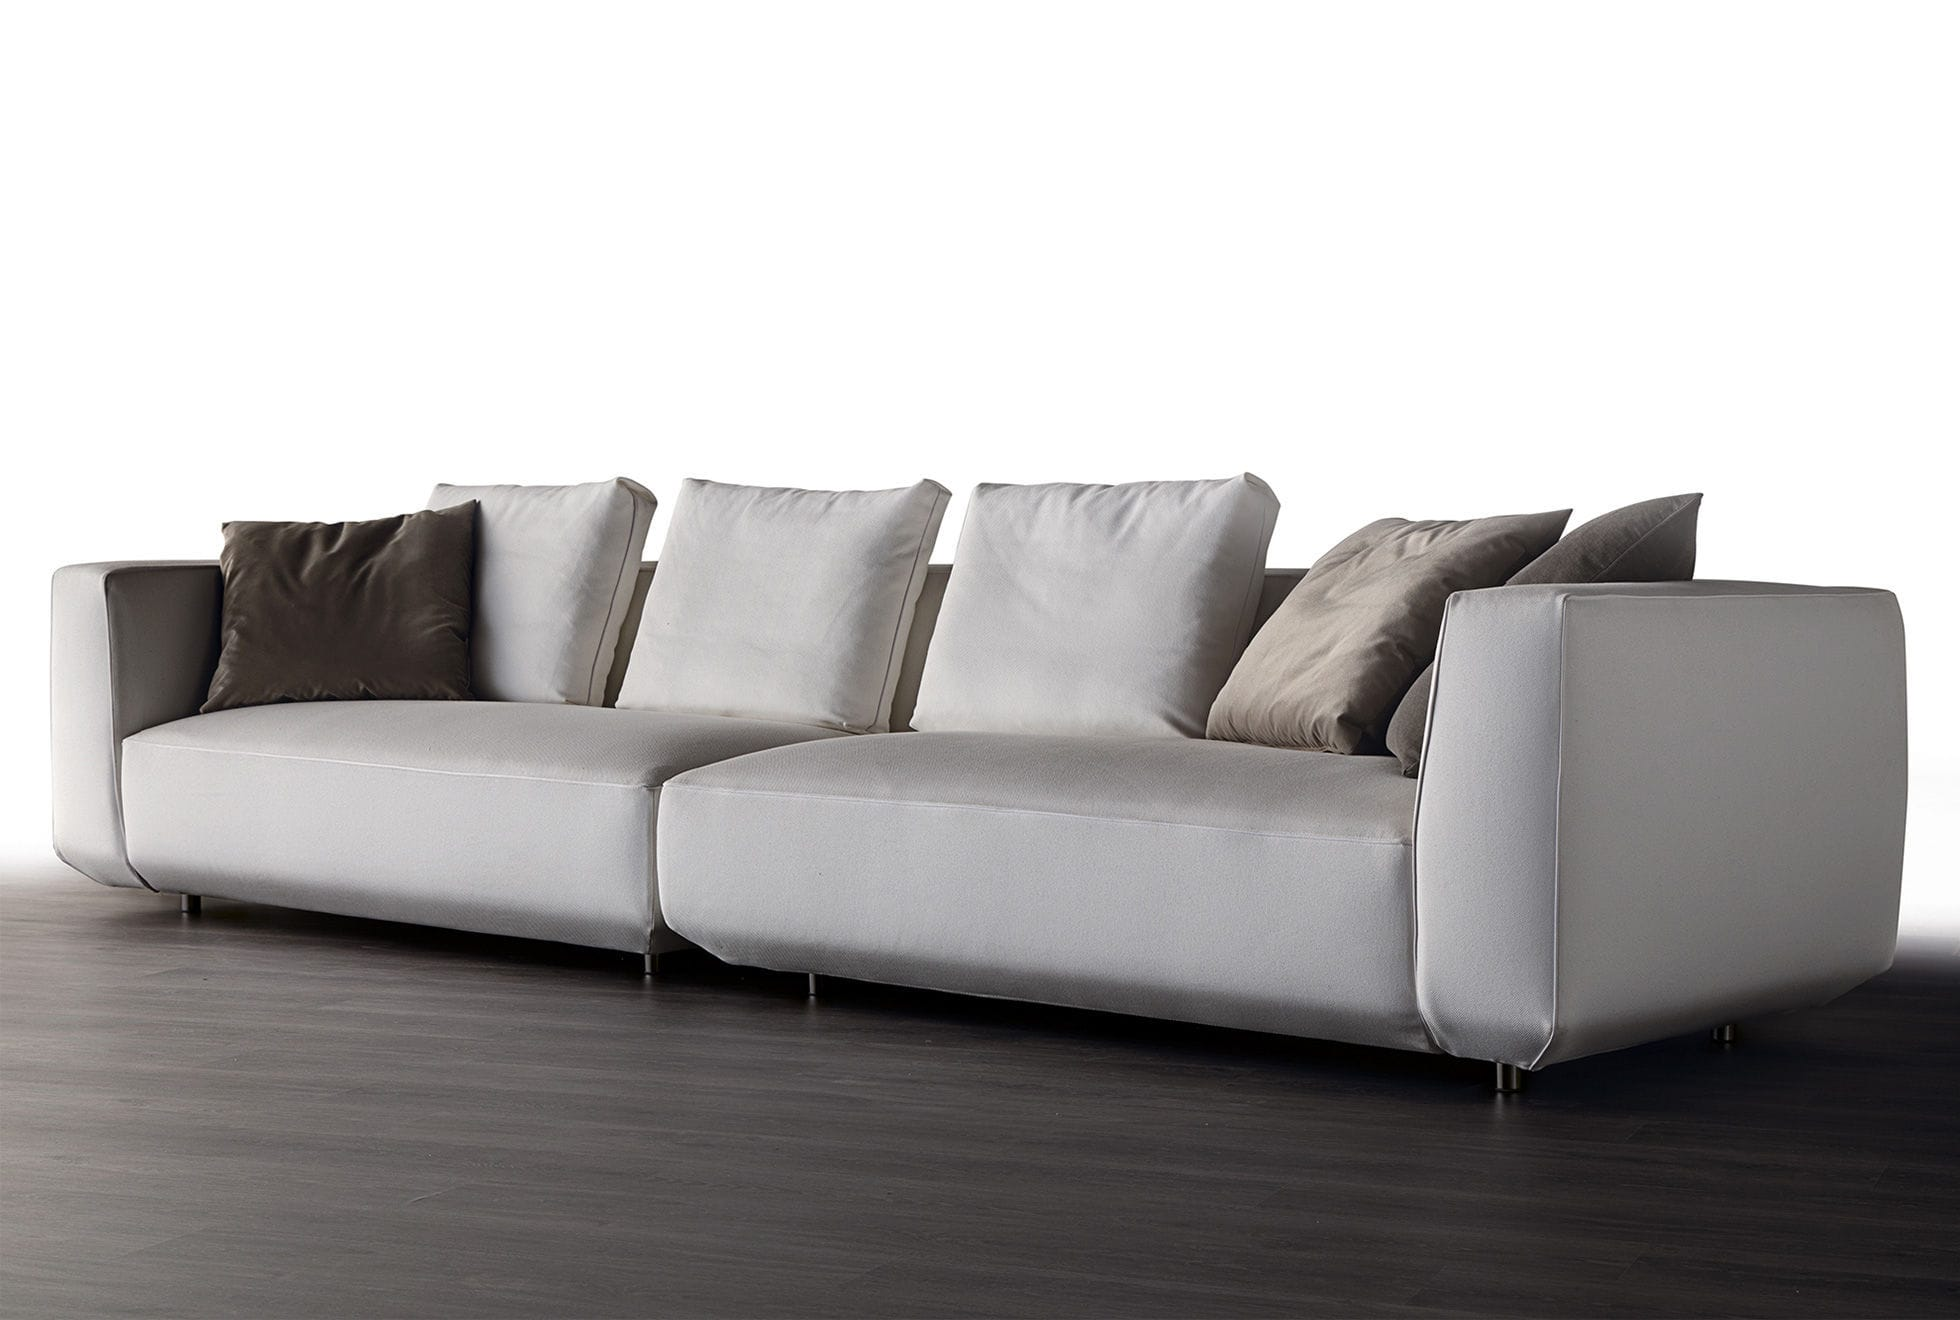 Modular sofa contemporary fabric leather OLTRE art nova srl